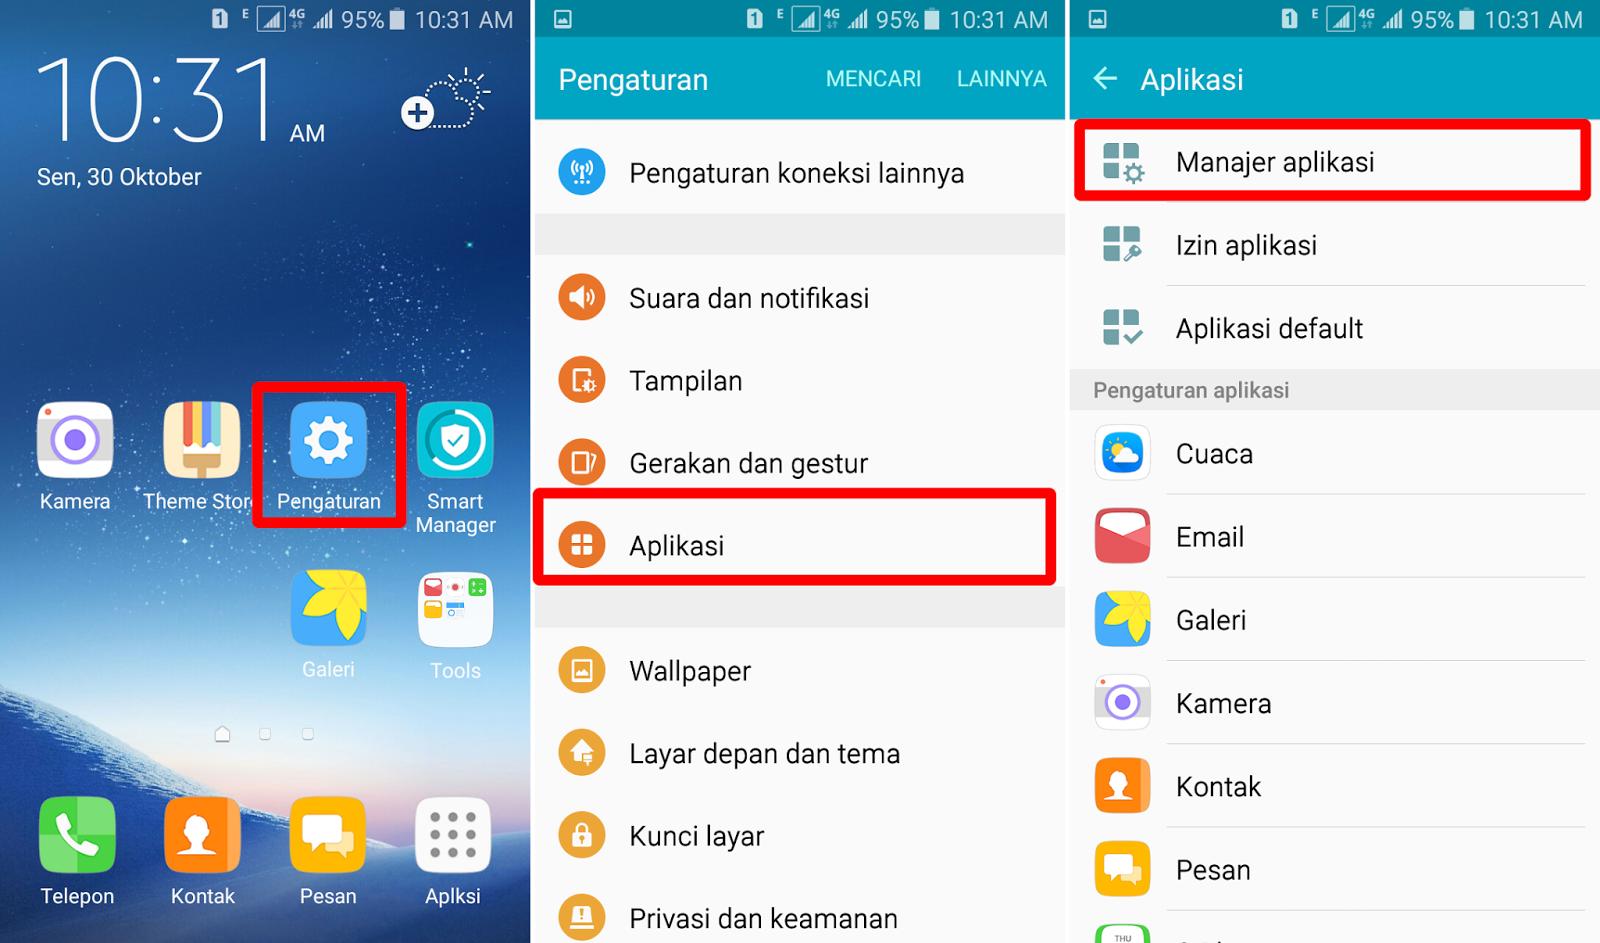 Cara Menghapus Data Aplikasi Di Hp Samsung Tutorial Teknologi